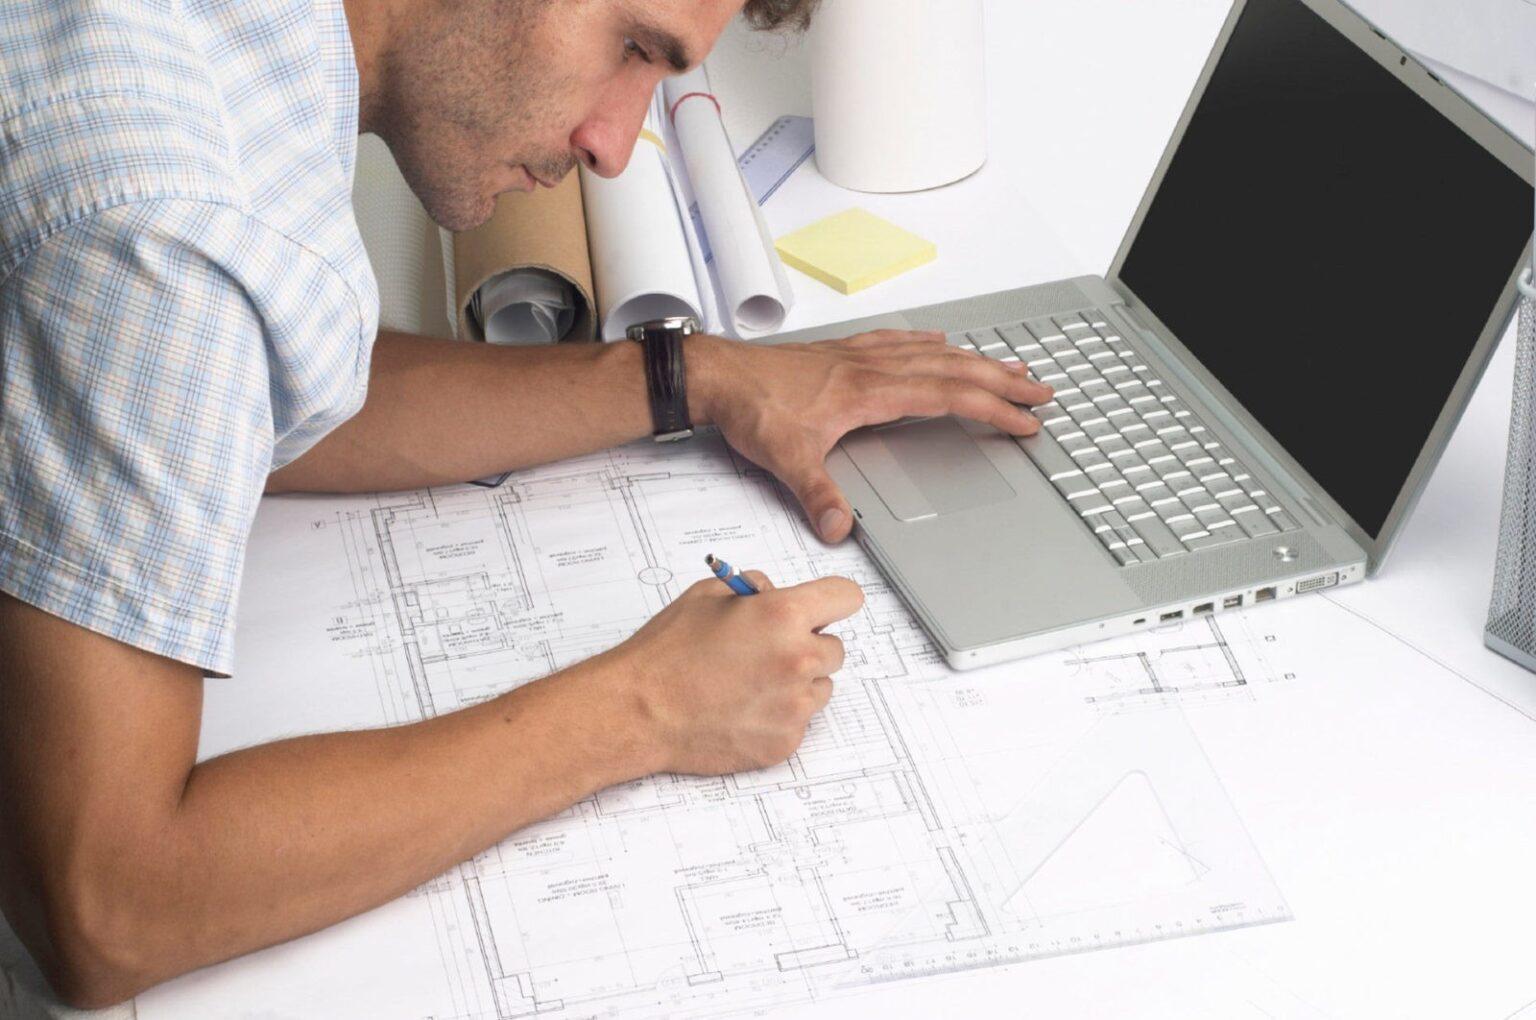 Удаленная работа на инженер конструктор удаленная работа онлайн менеджер